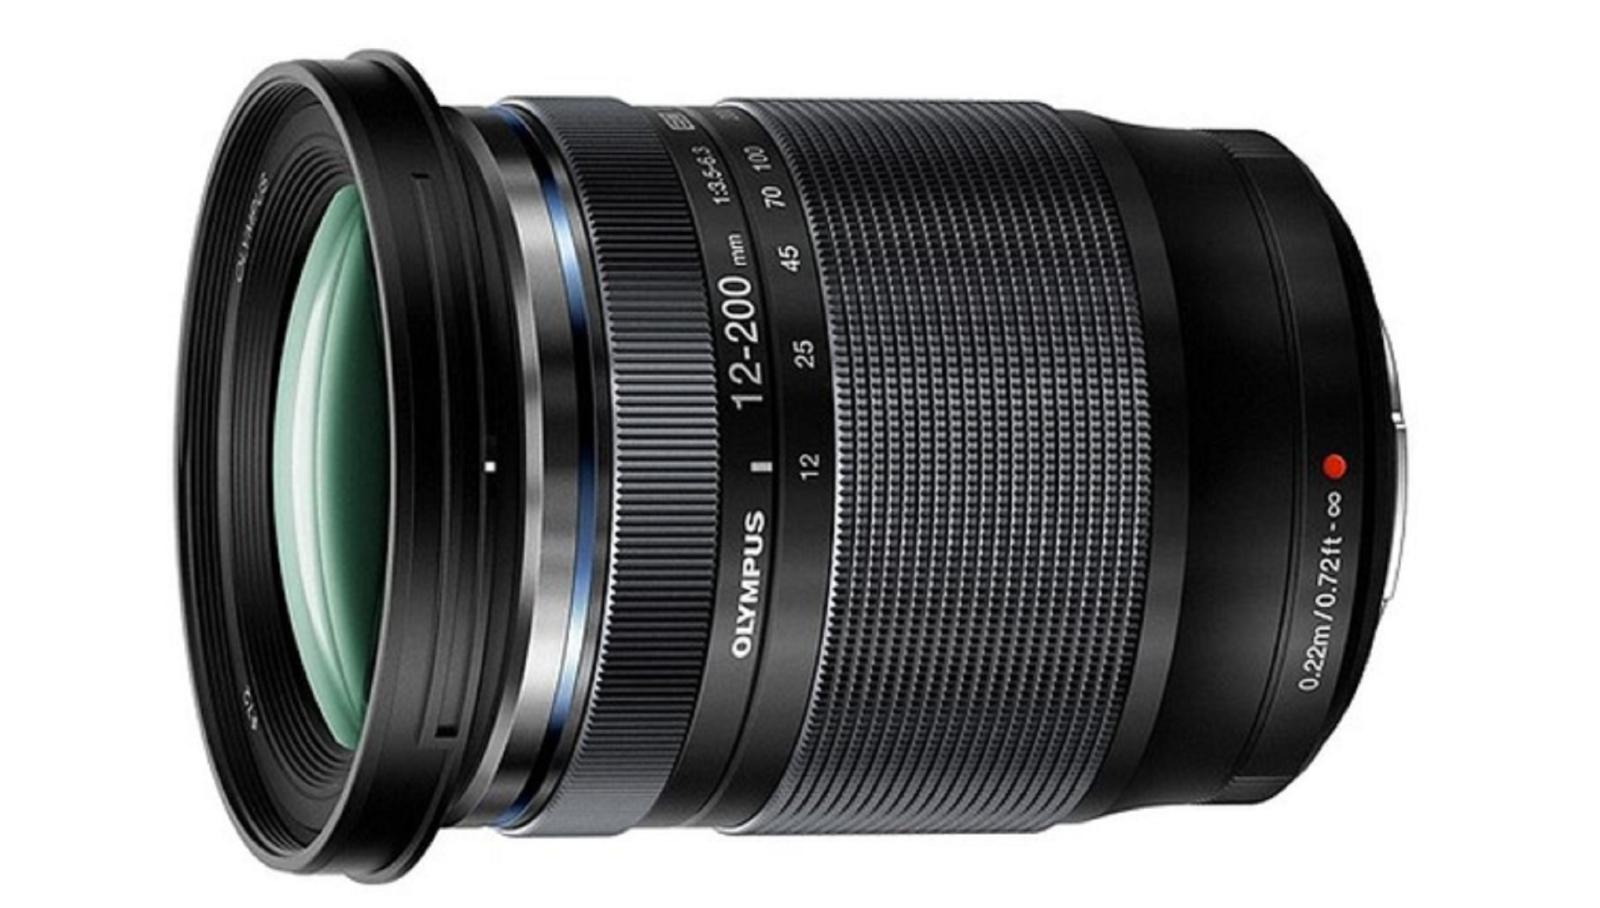 Olympusra mắt ống kính siêu zoom mới, M.Zuiko Digital ED 12-200mm f / 3.5-6.3